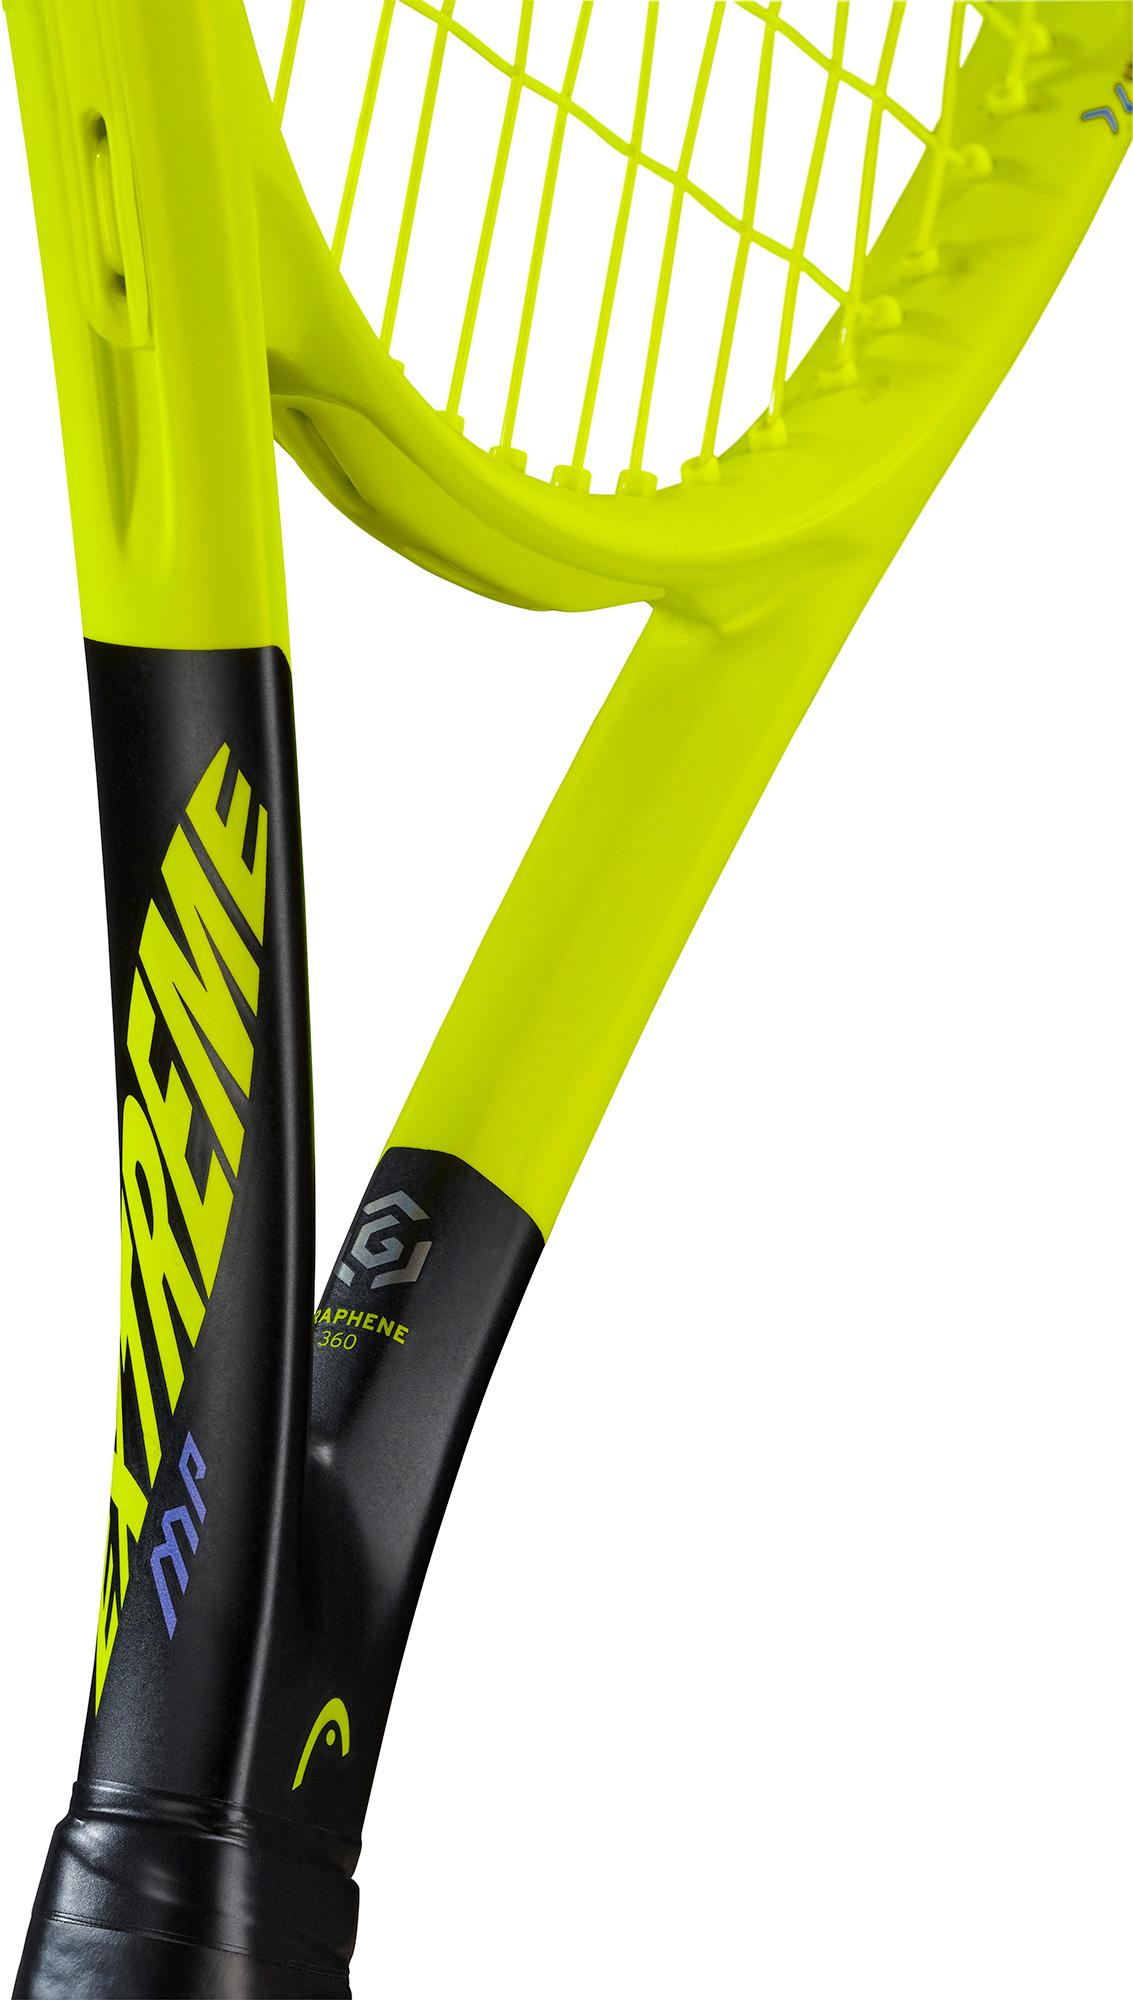 Head Graphene 360 Extreme S - Tennis Scanner